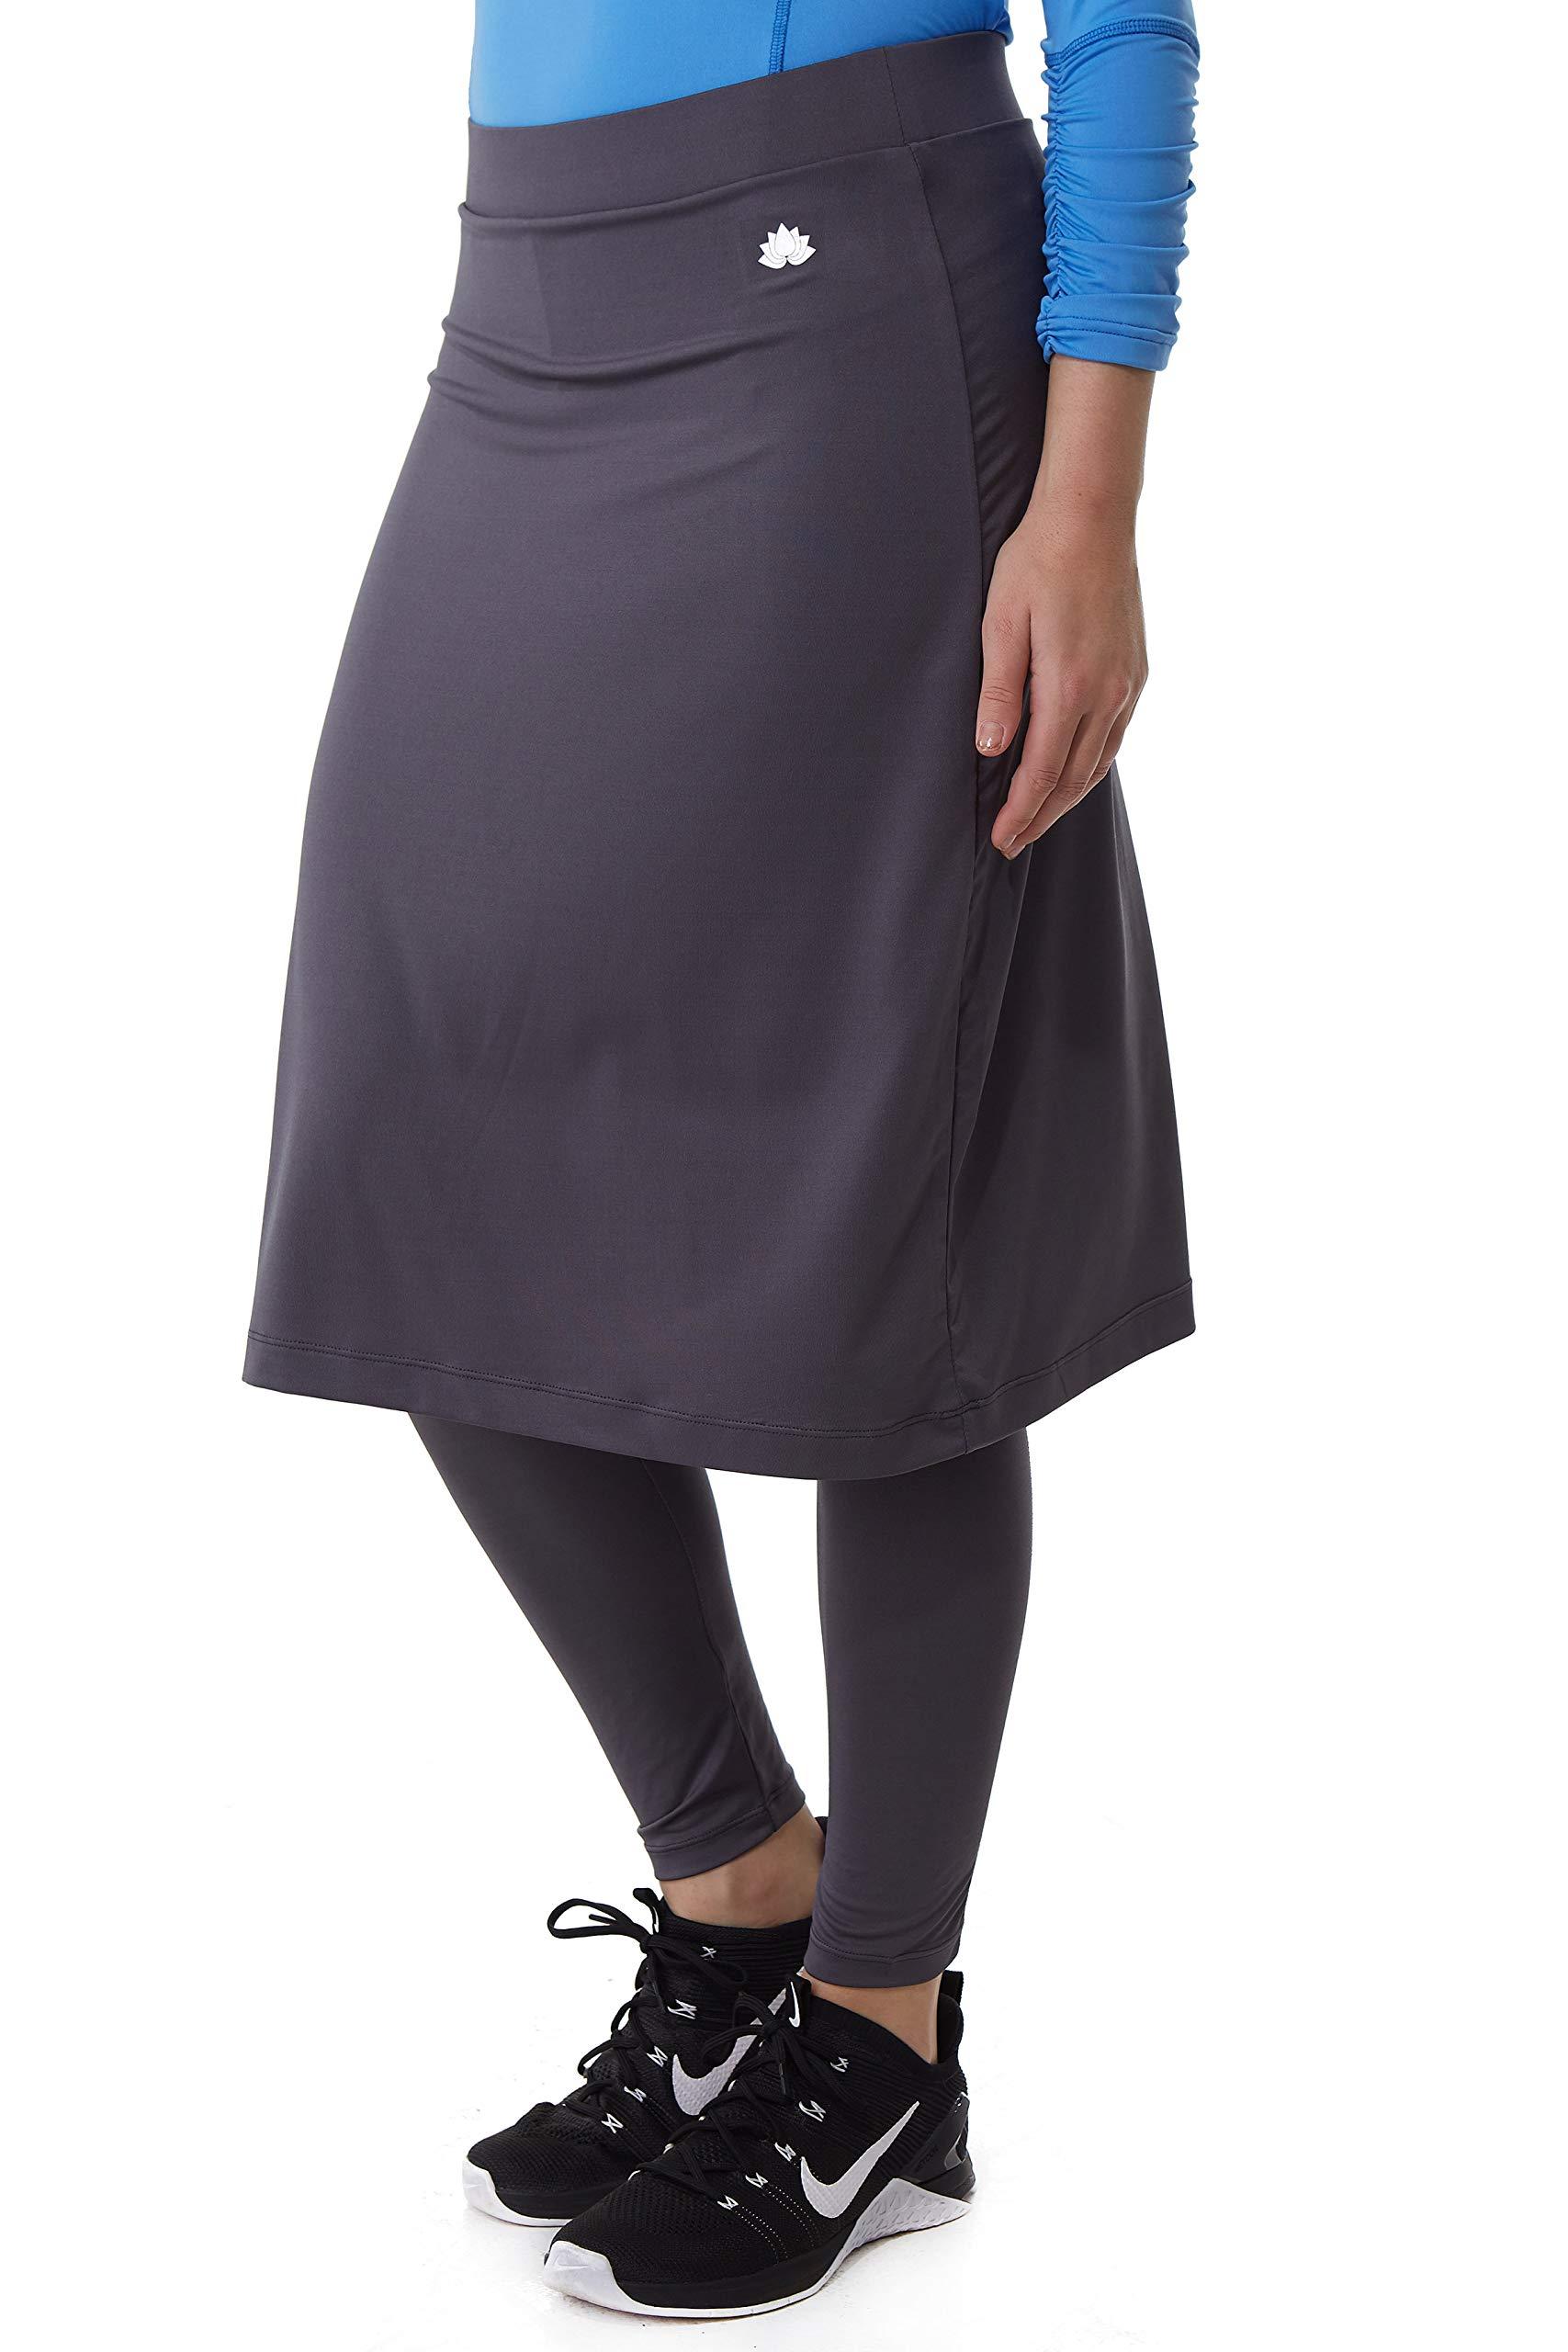 Snoga Athletics Active Midi Skirt with Ankle-Length Leggings - Smoke Grey, XS